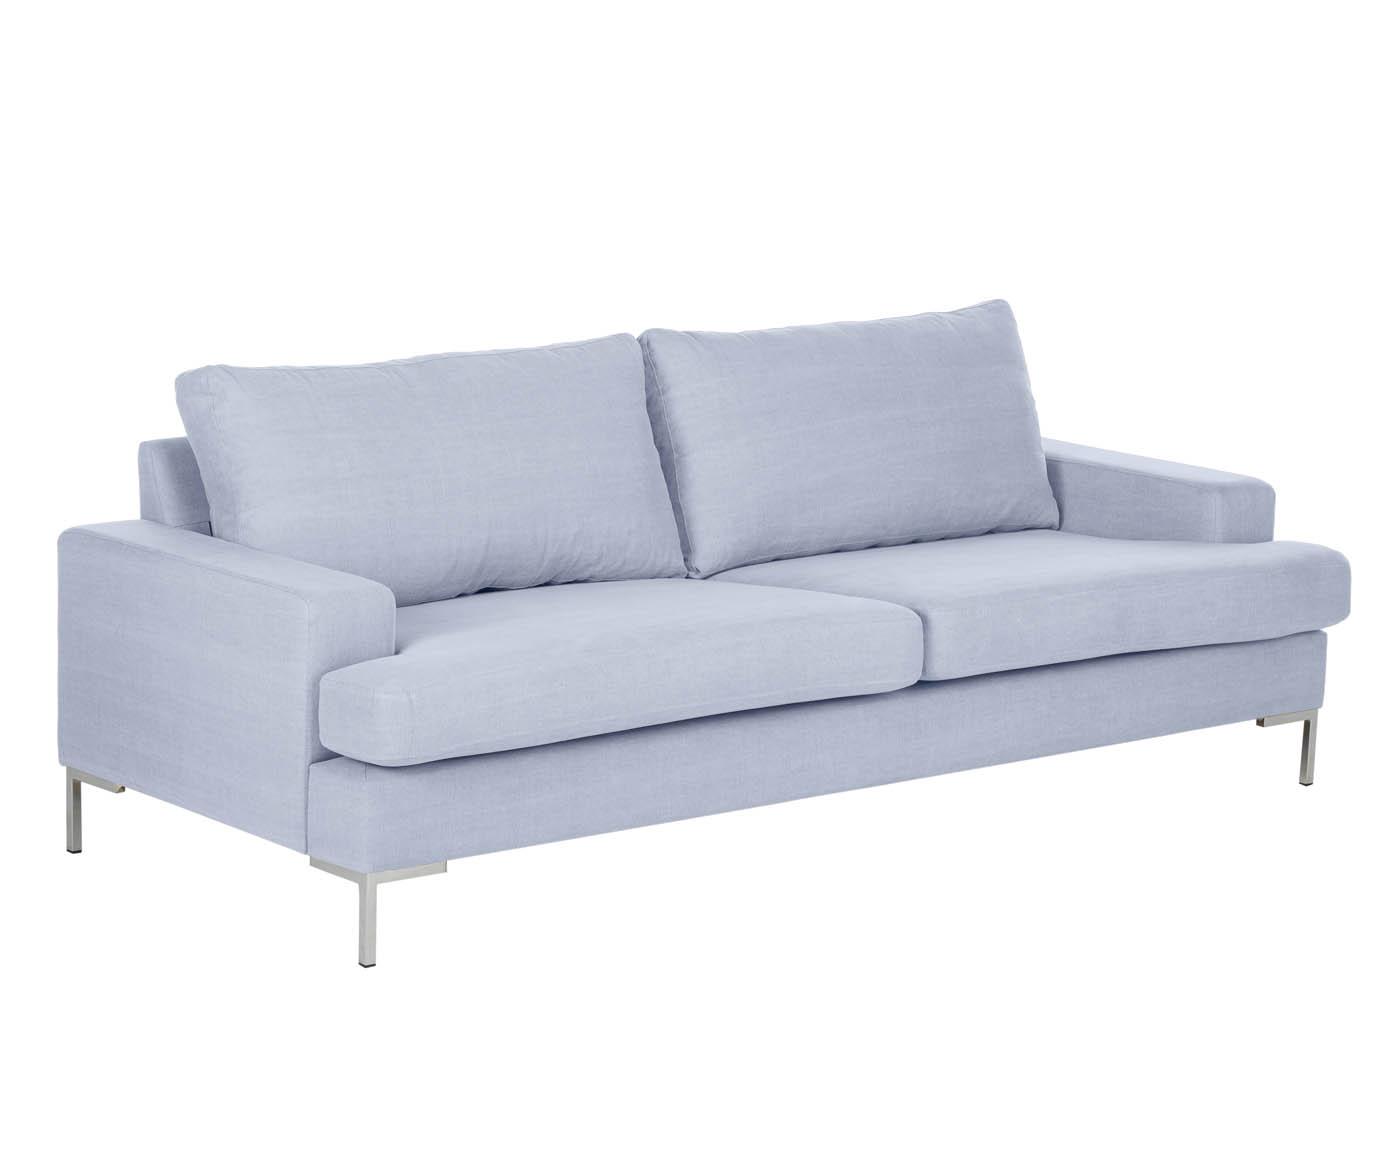 Journelles maison bunte sofas westwing frany hellblau for Sofa hellblau